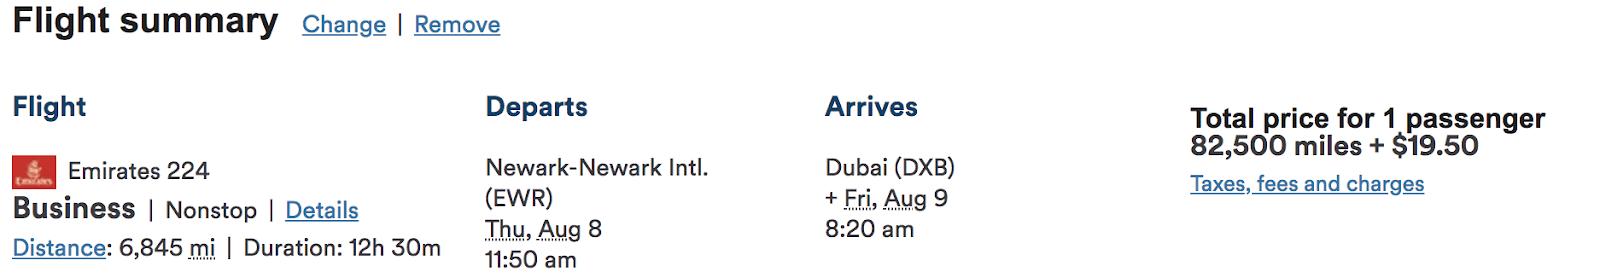 Alaska Emirates flight summary